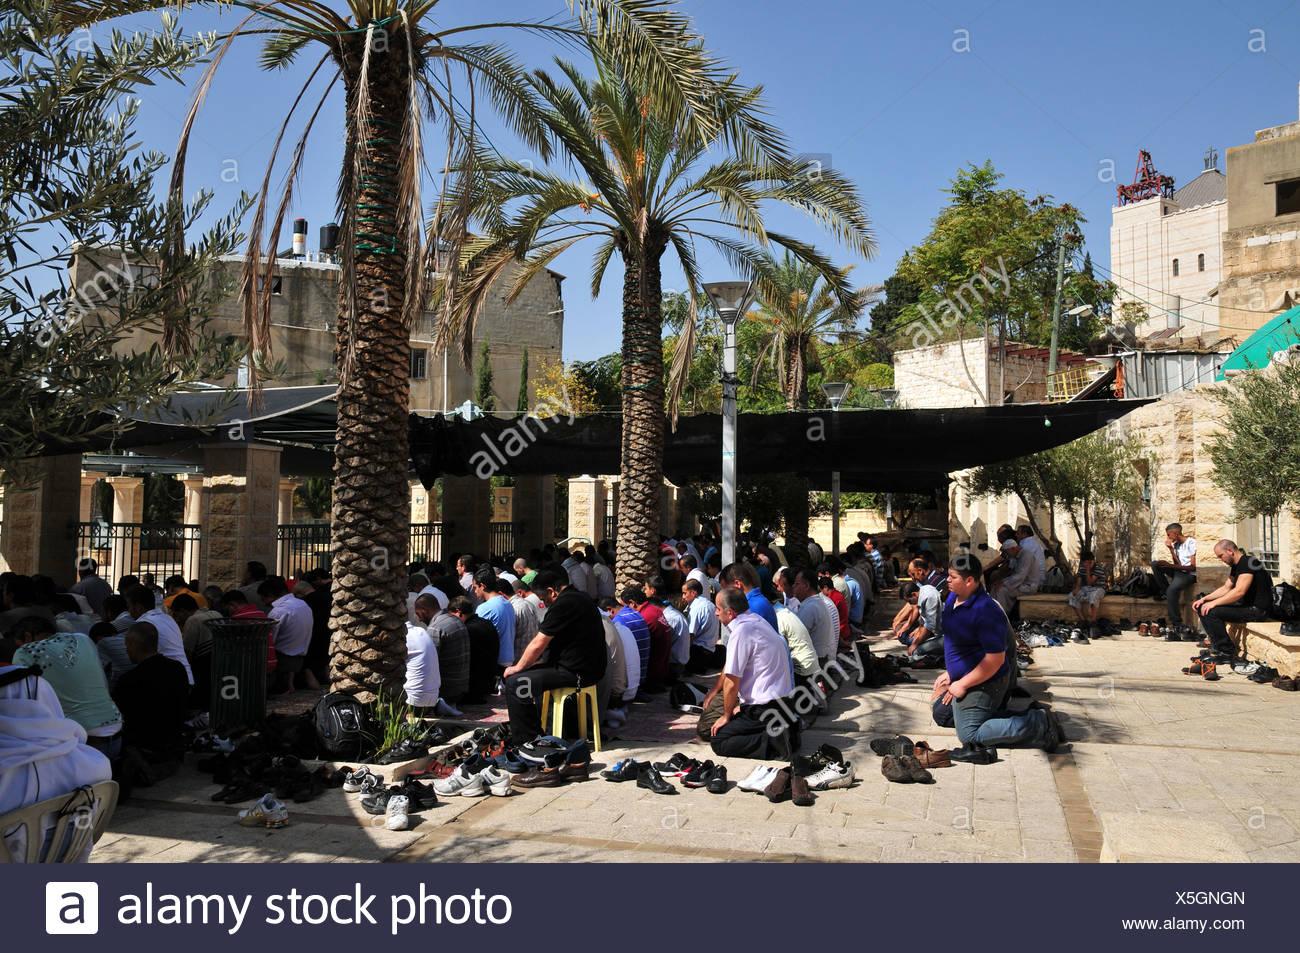 Israel, Nazareth A large group of Muslims at prayer - Stock Image